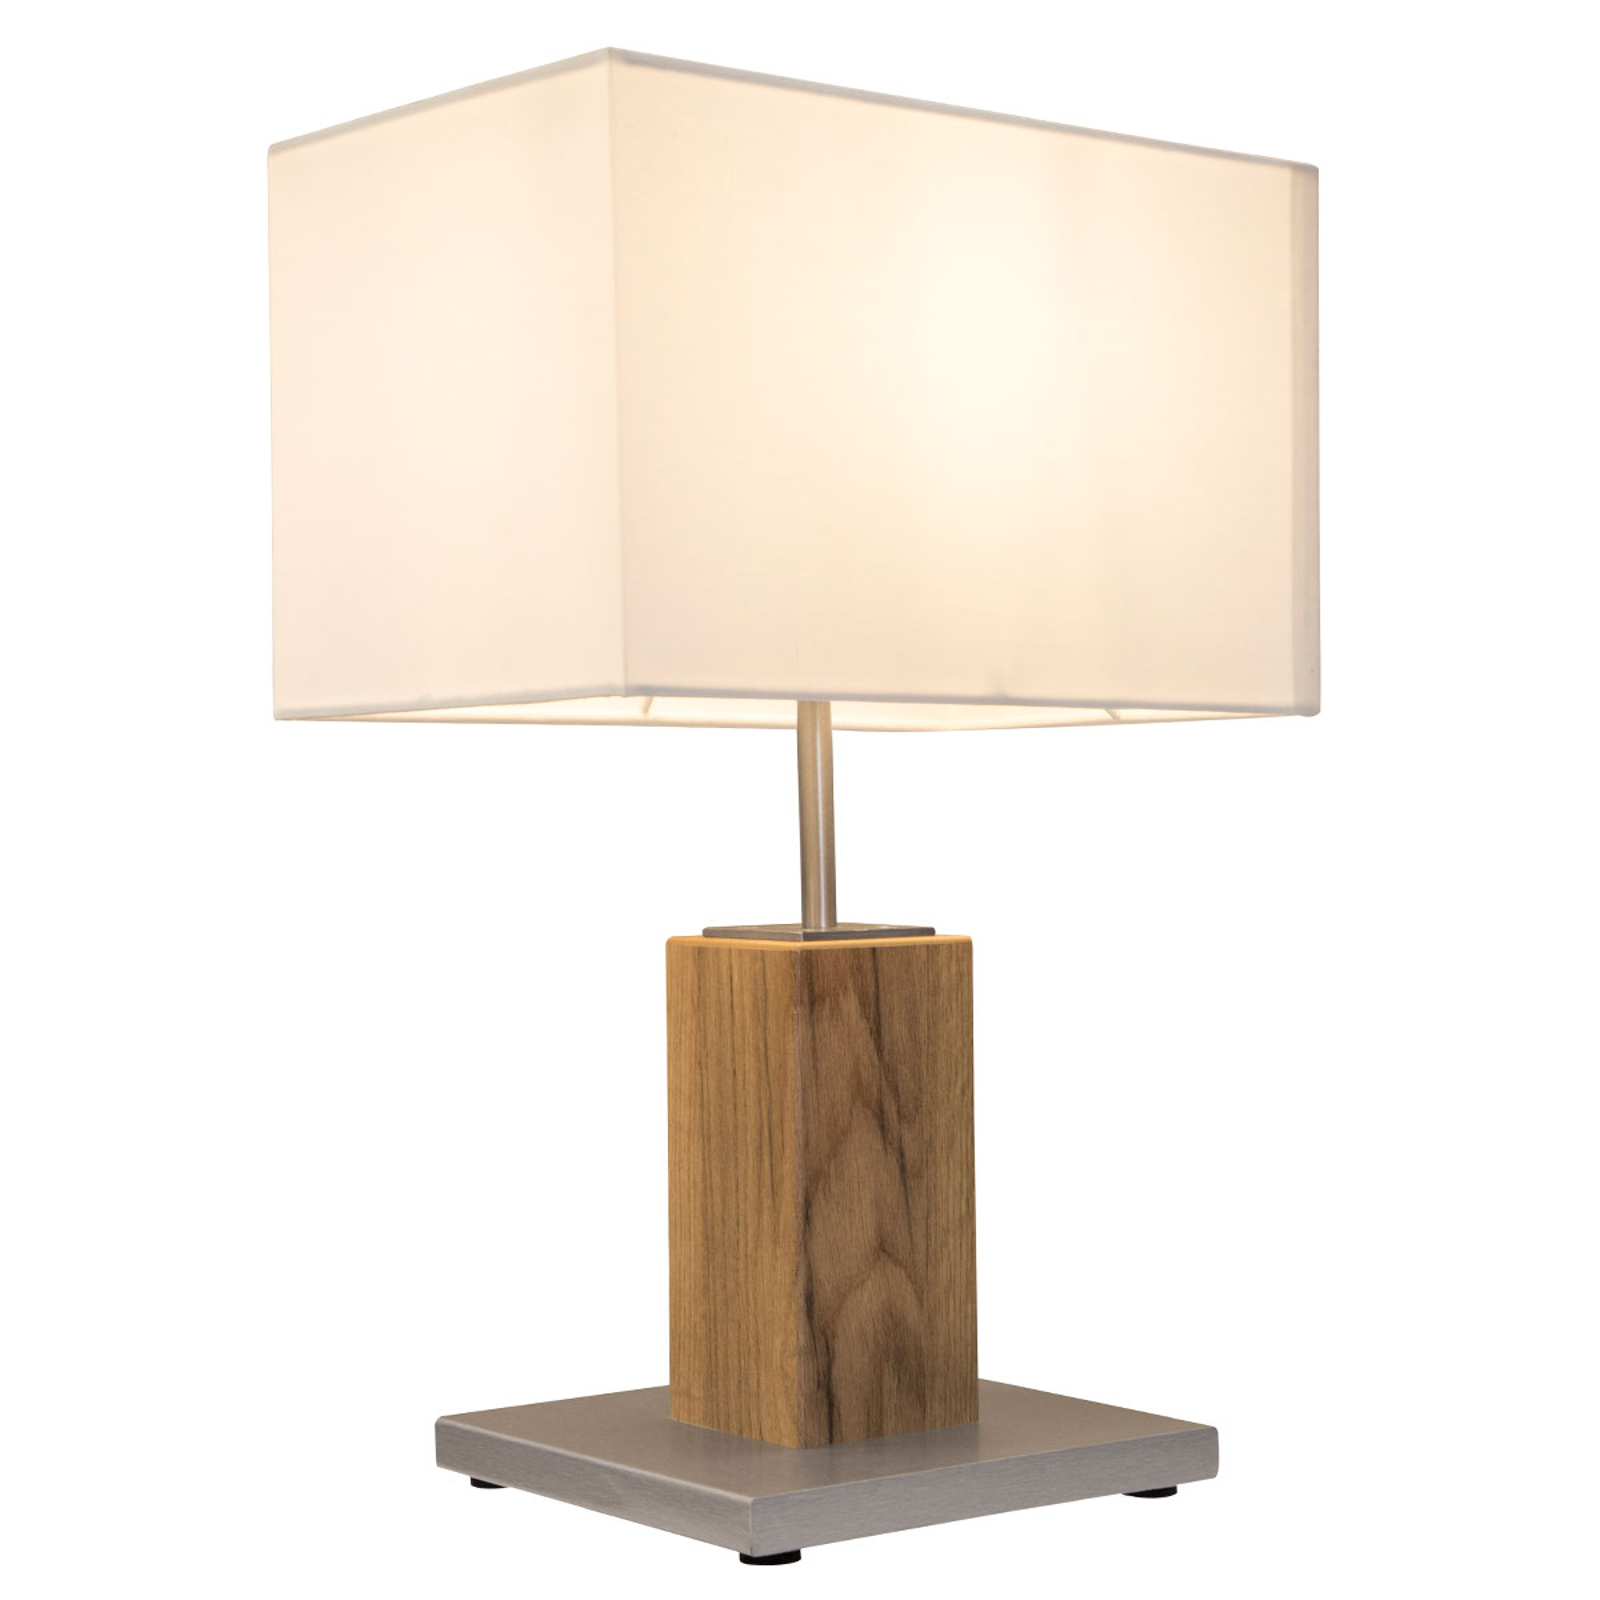 Tafellamp Gump met stoffen kap